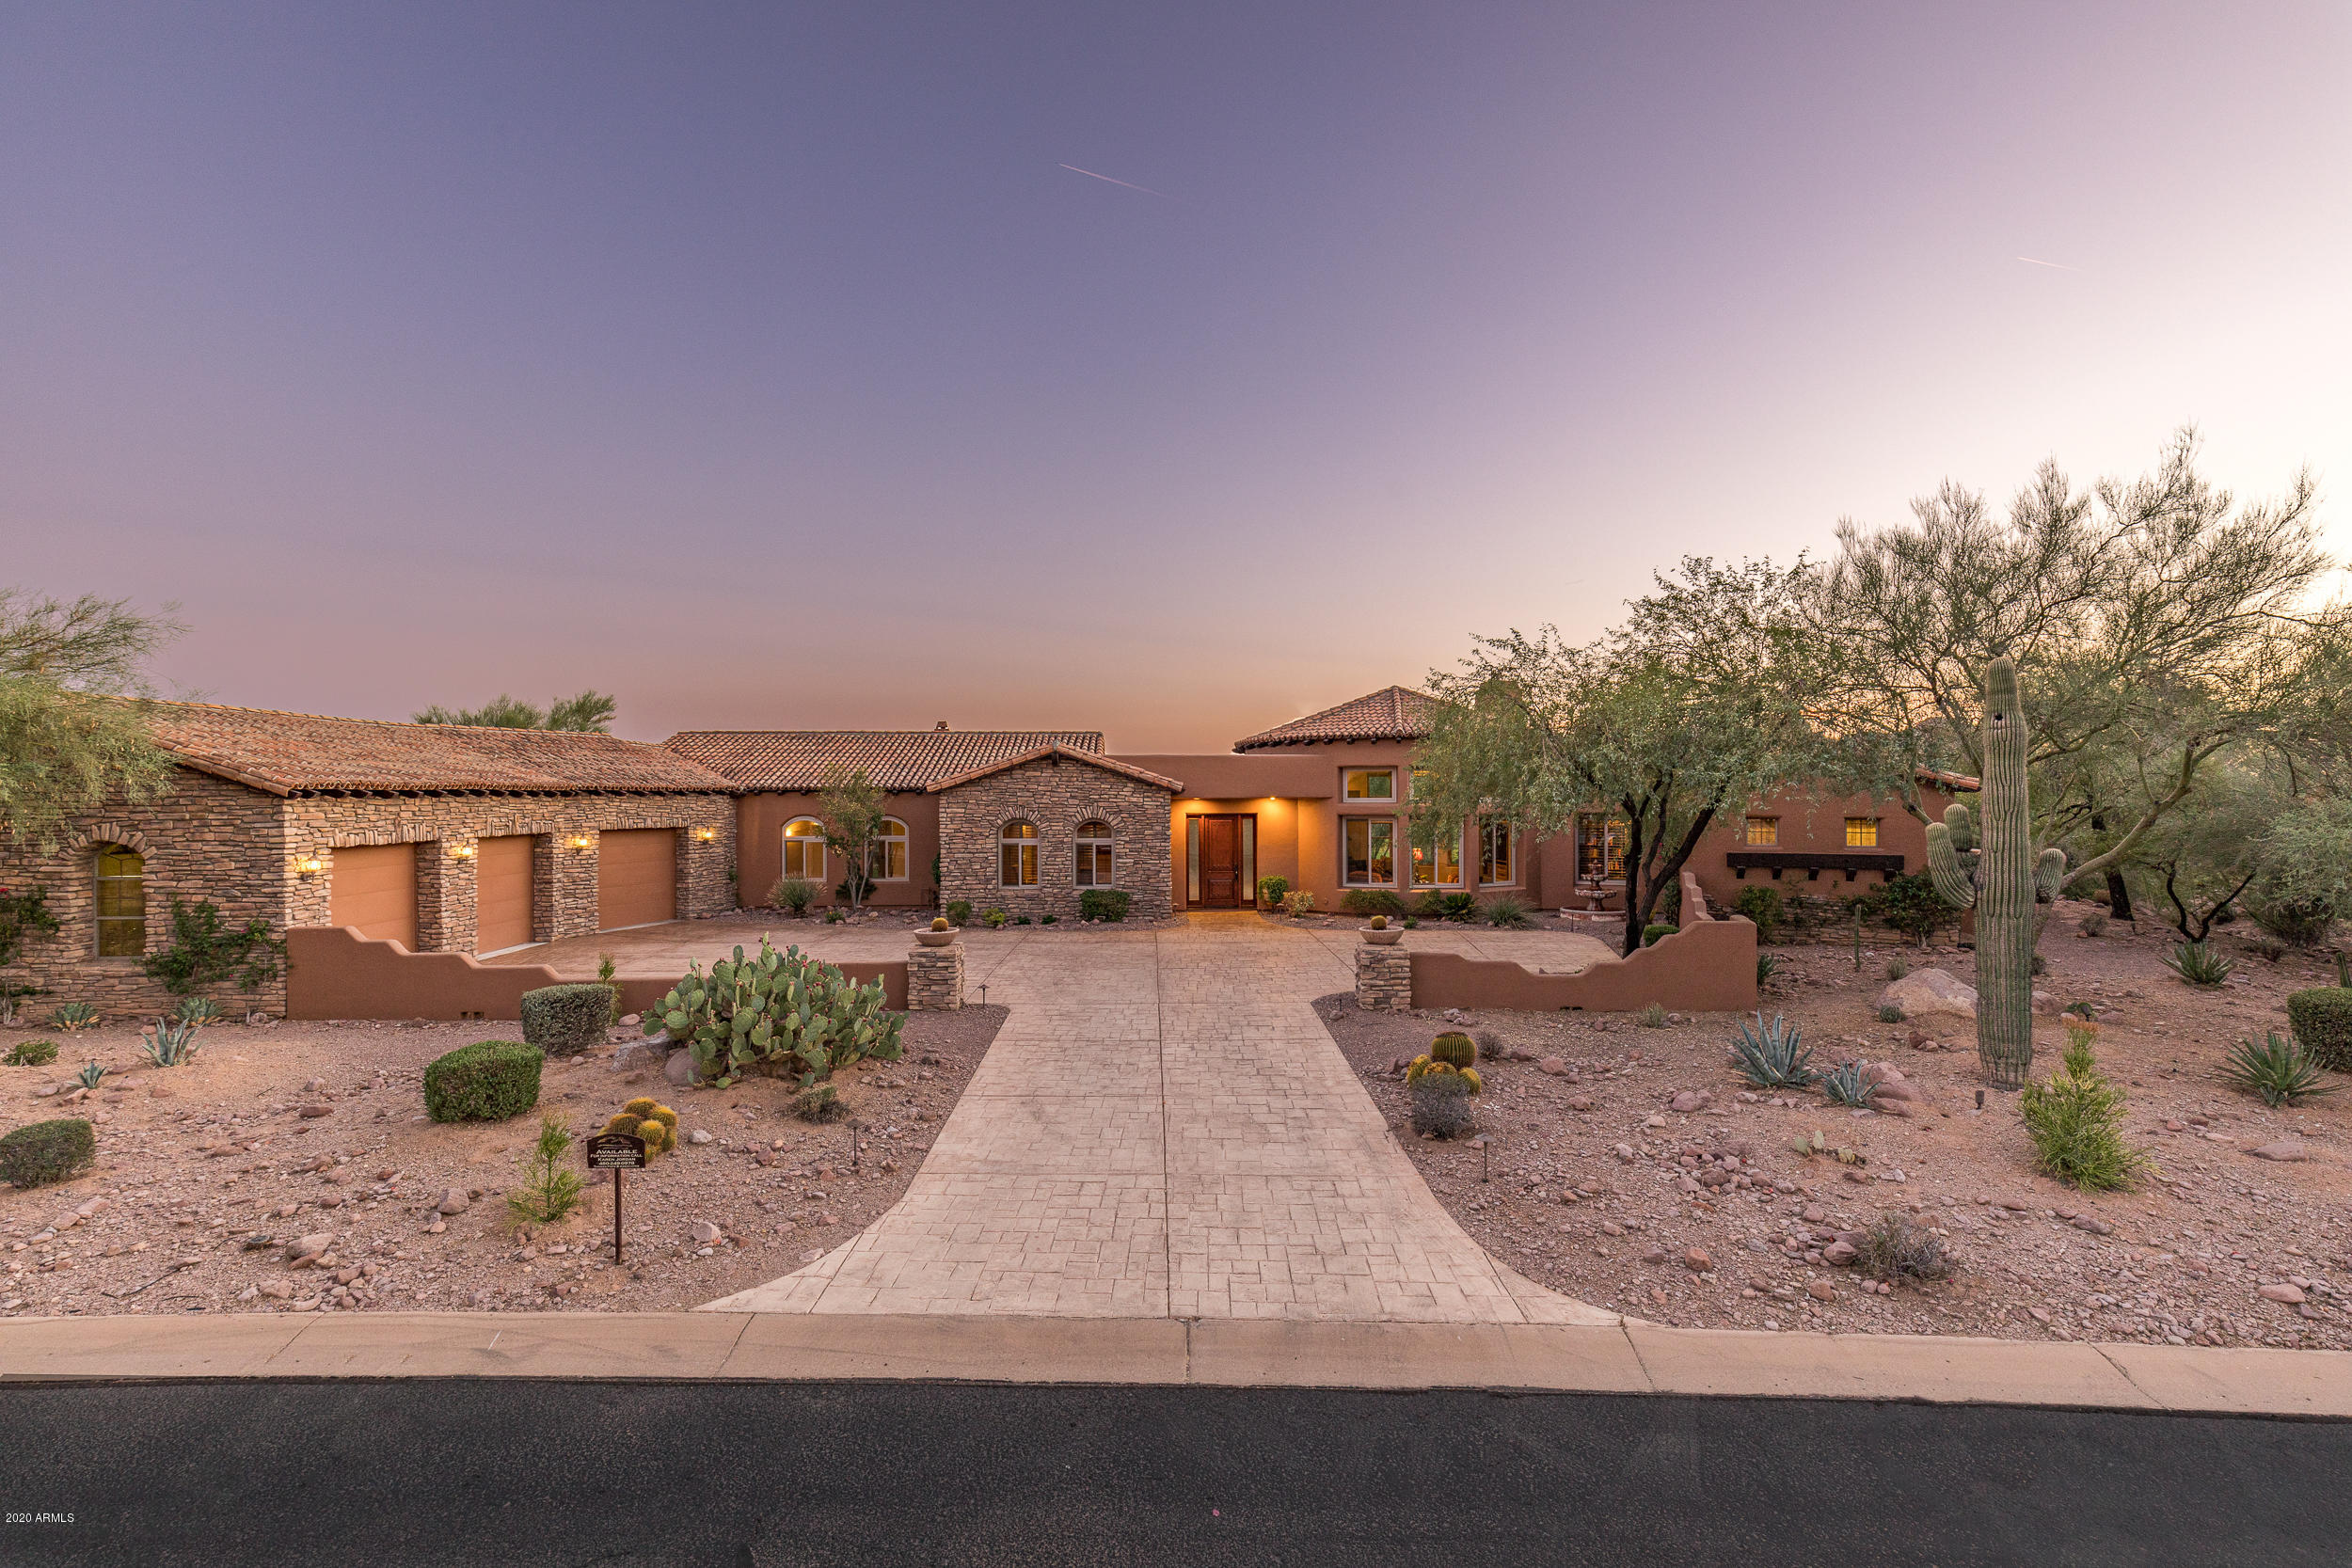 MLS 6131700 7081 E JUNIPER VILLAGE Drive, Gold Canyon, AZ 85118 Gold Canyon AZ 3 or More Car Garage